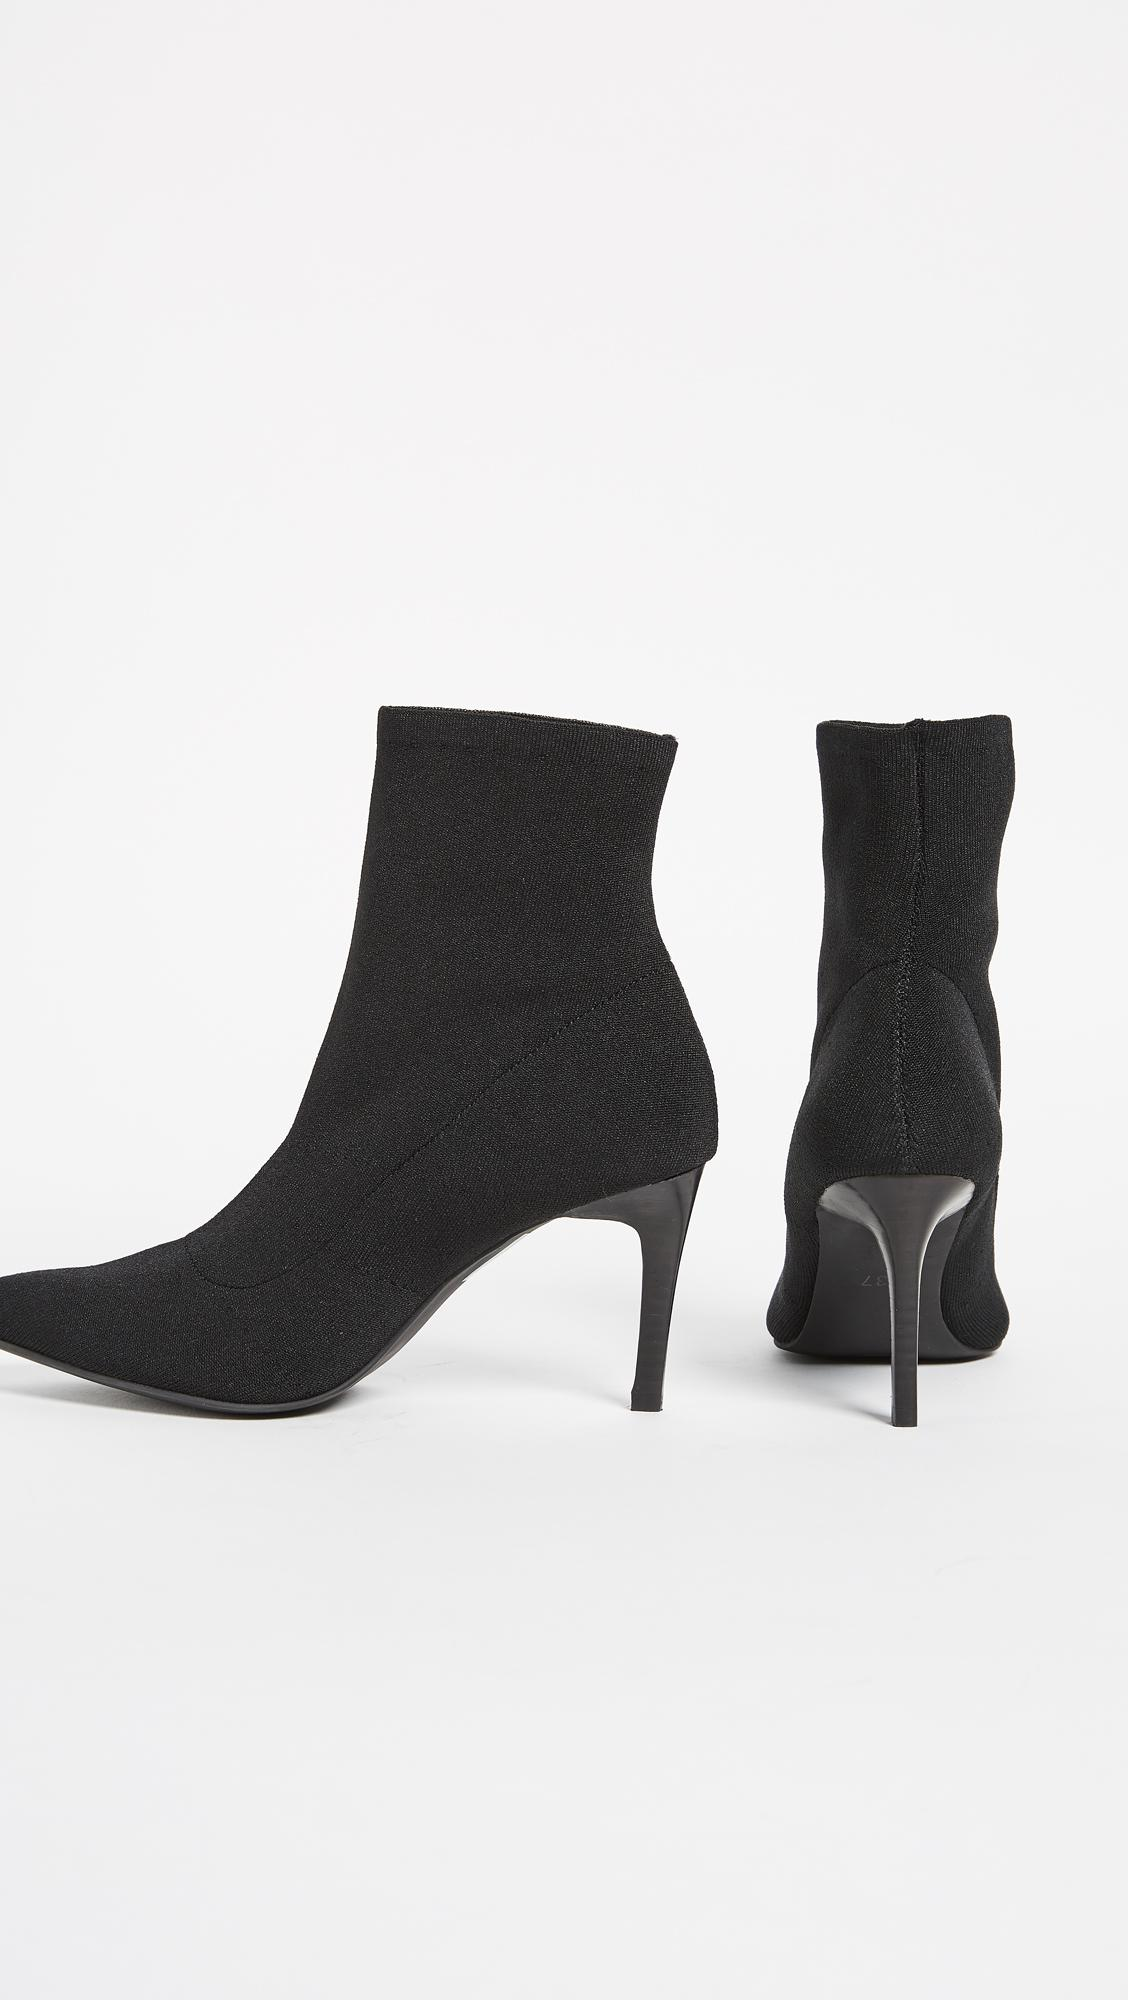 Sol Sana Ezra Booties in Black